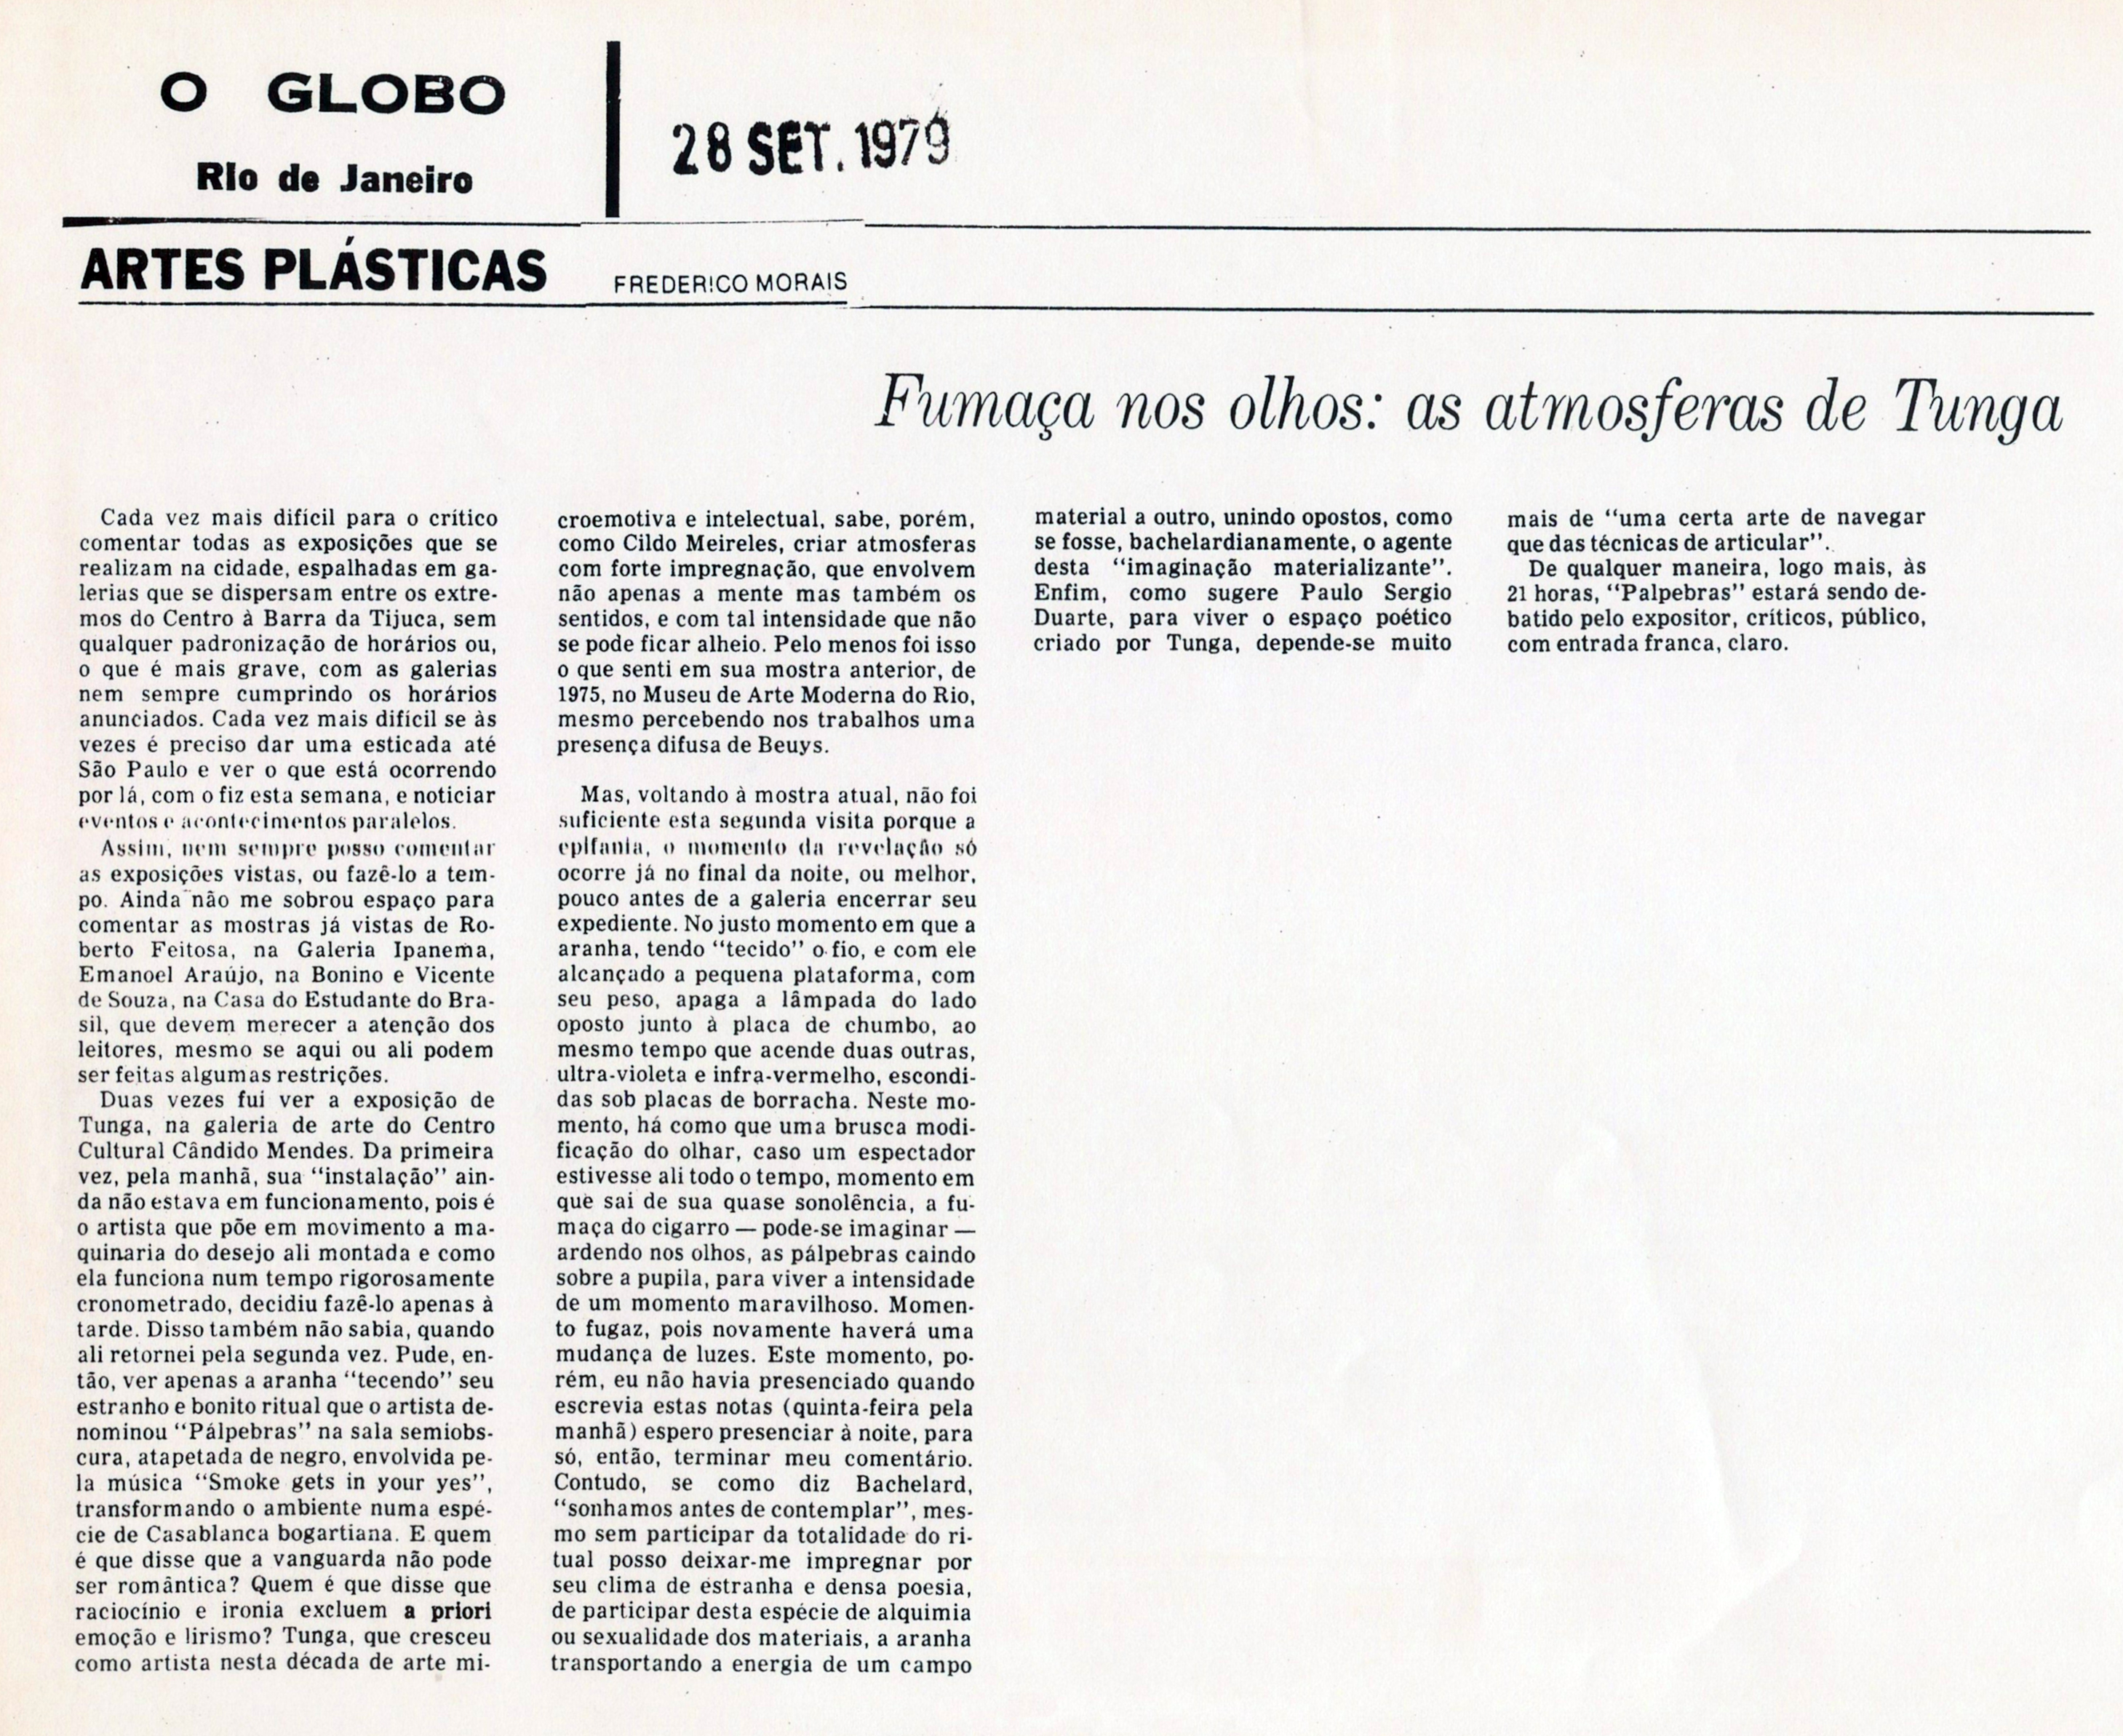 """Pálpebras"" – Centro Cultural Cândido Mendes"